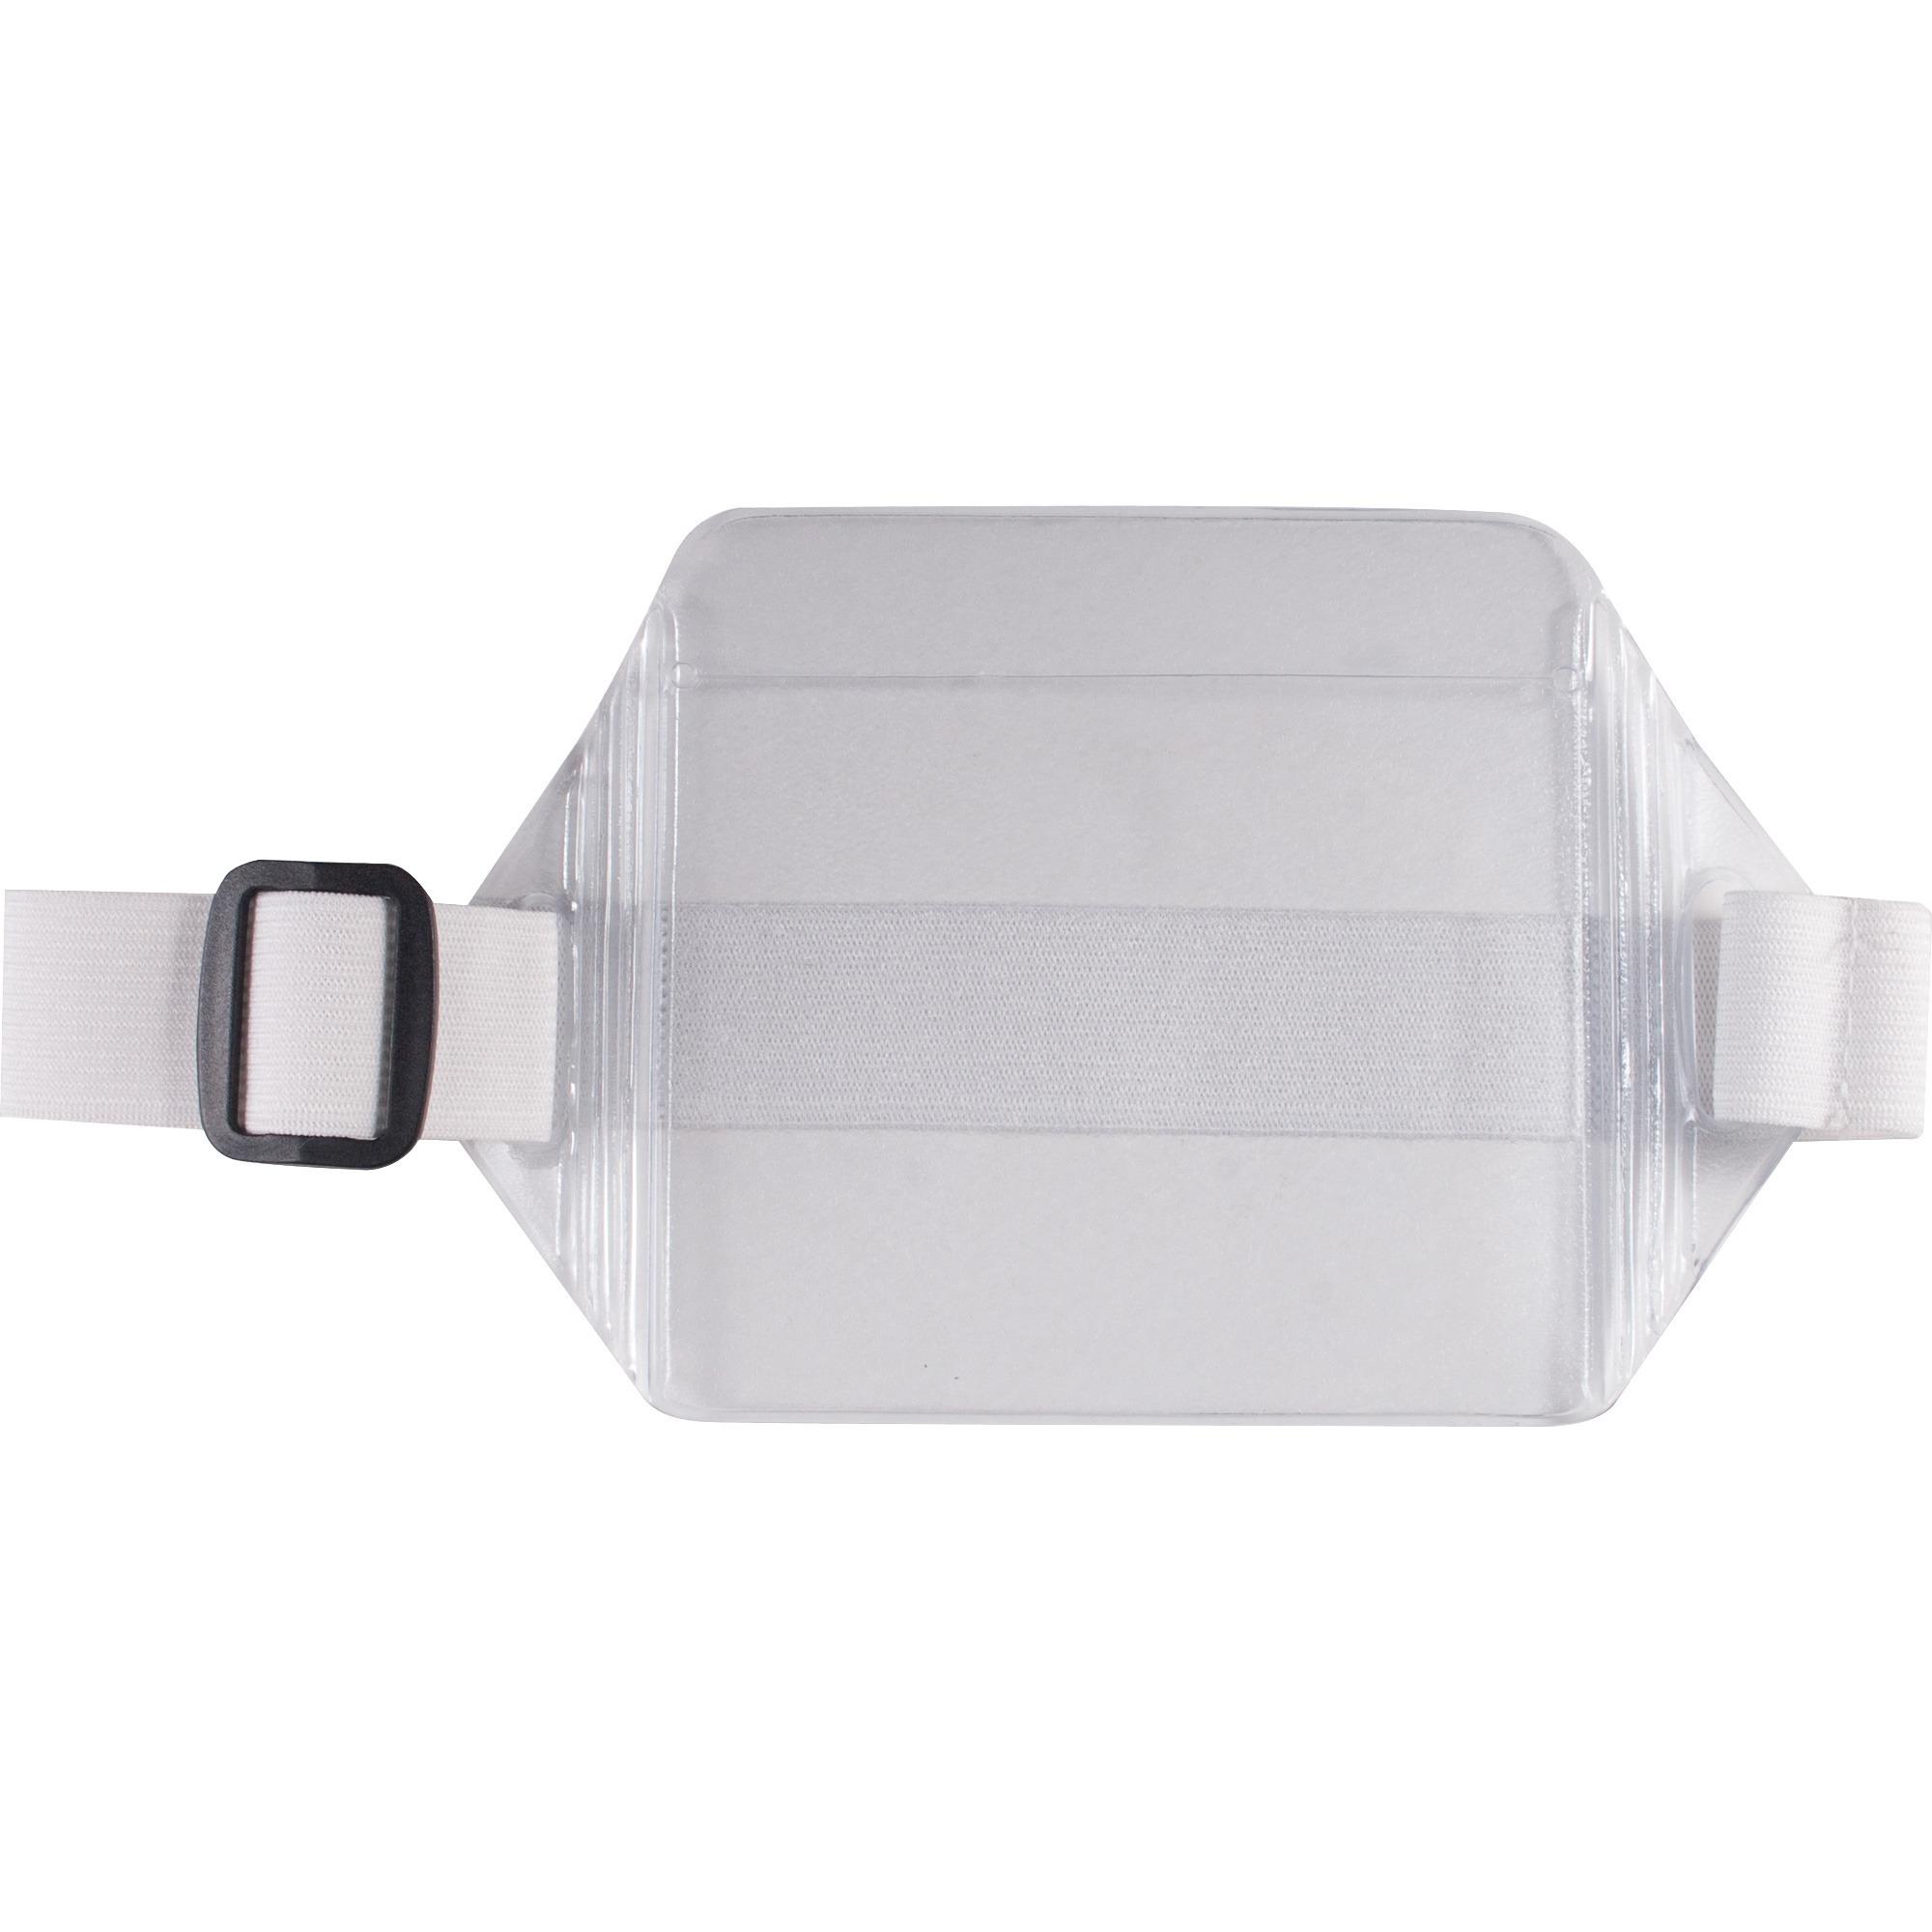 Horizontal Arm Badge Holder, 3 3/4 x 2 3/4, Clear/White. 12 per Box